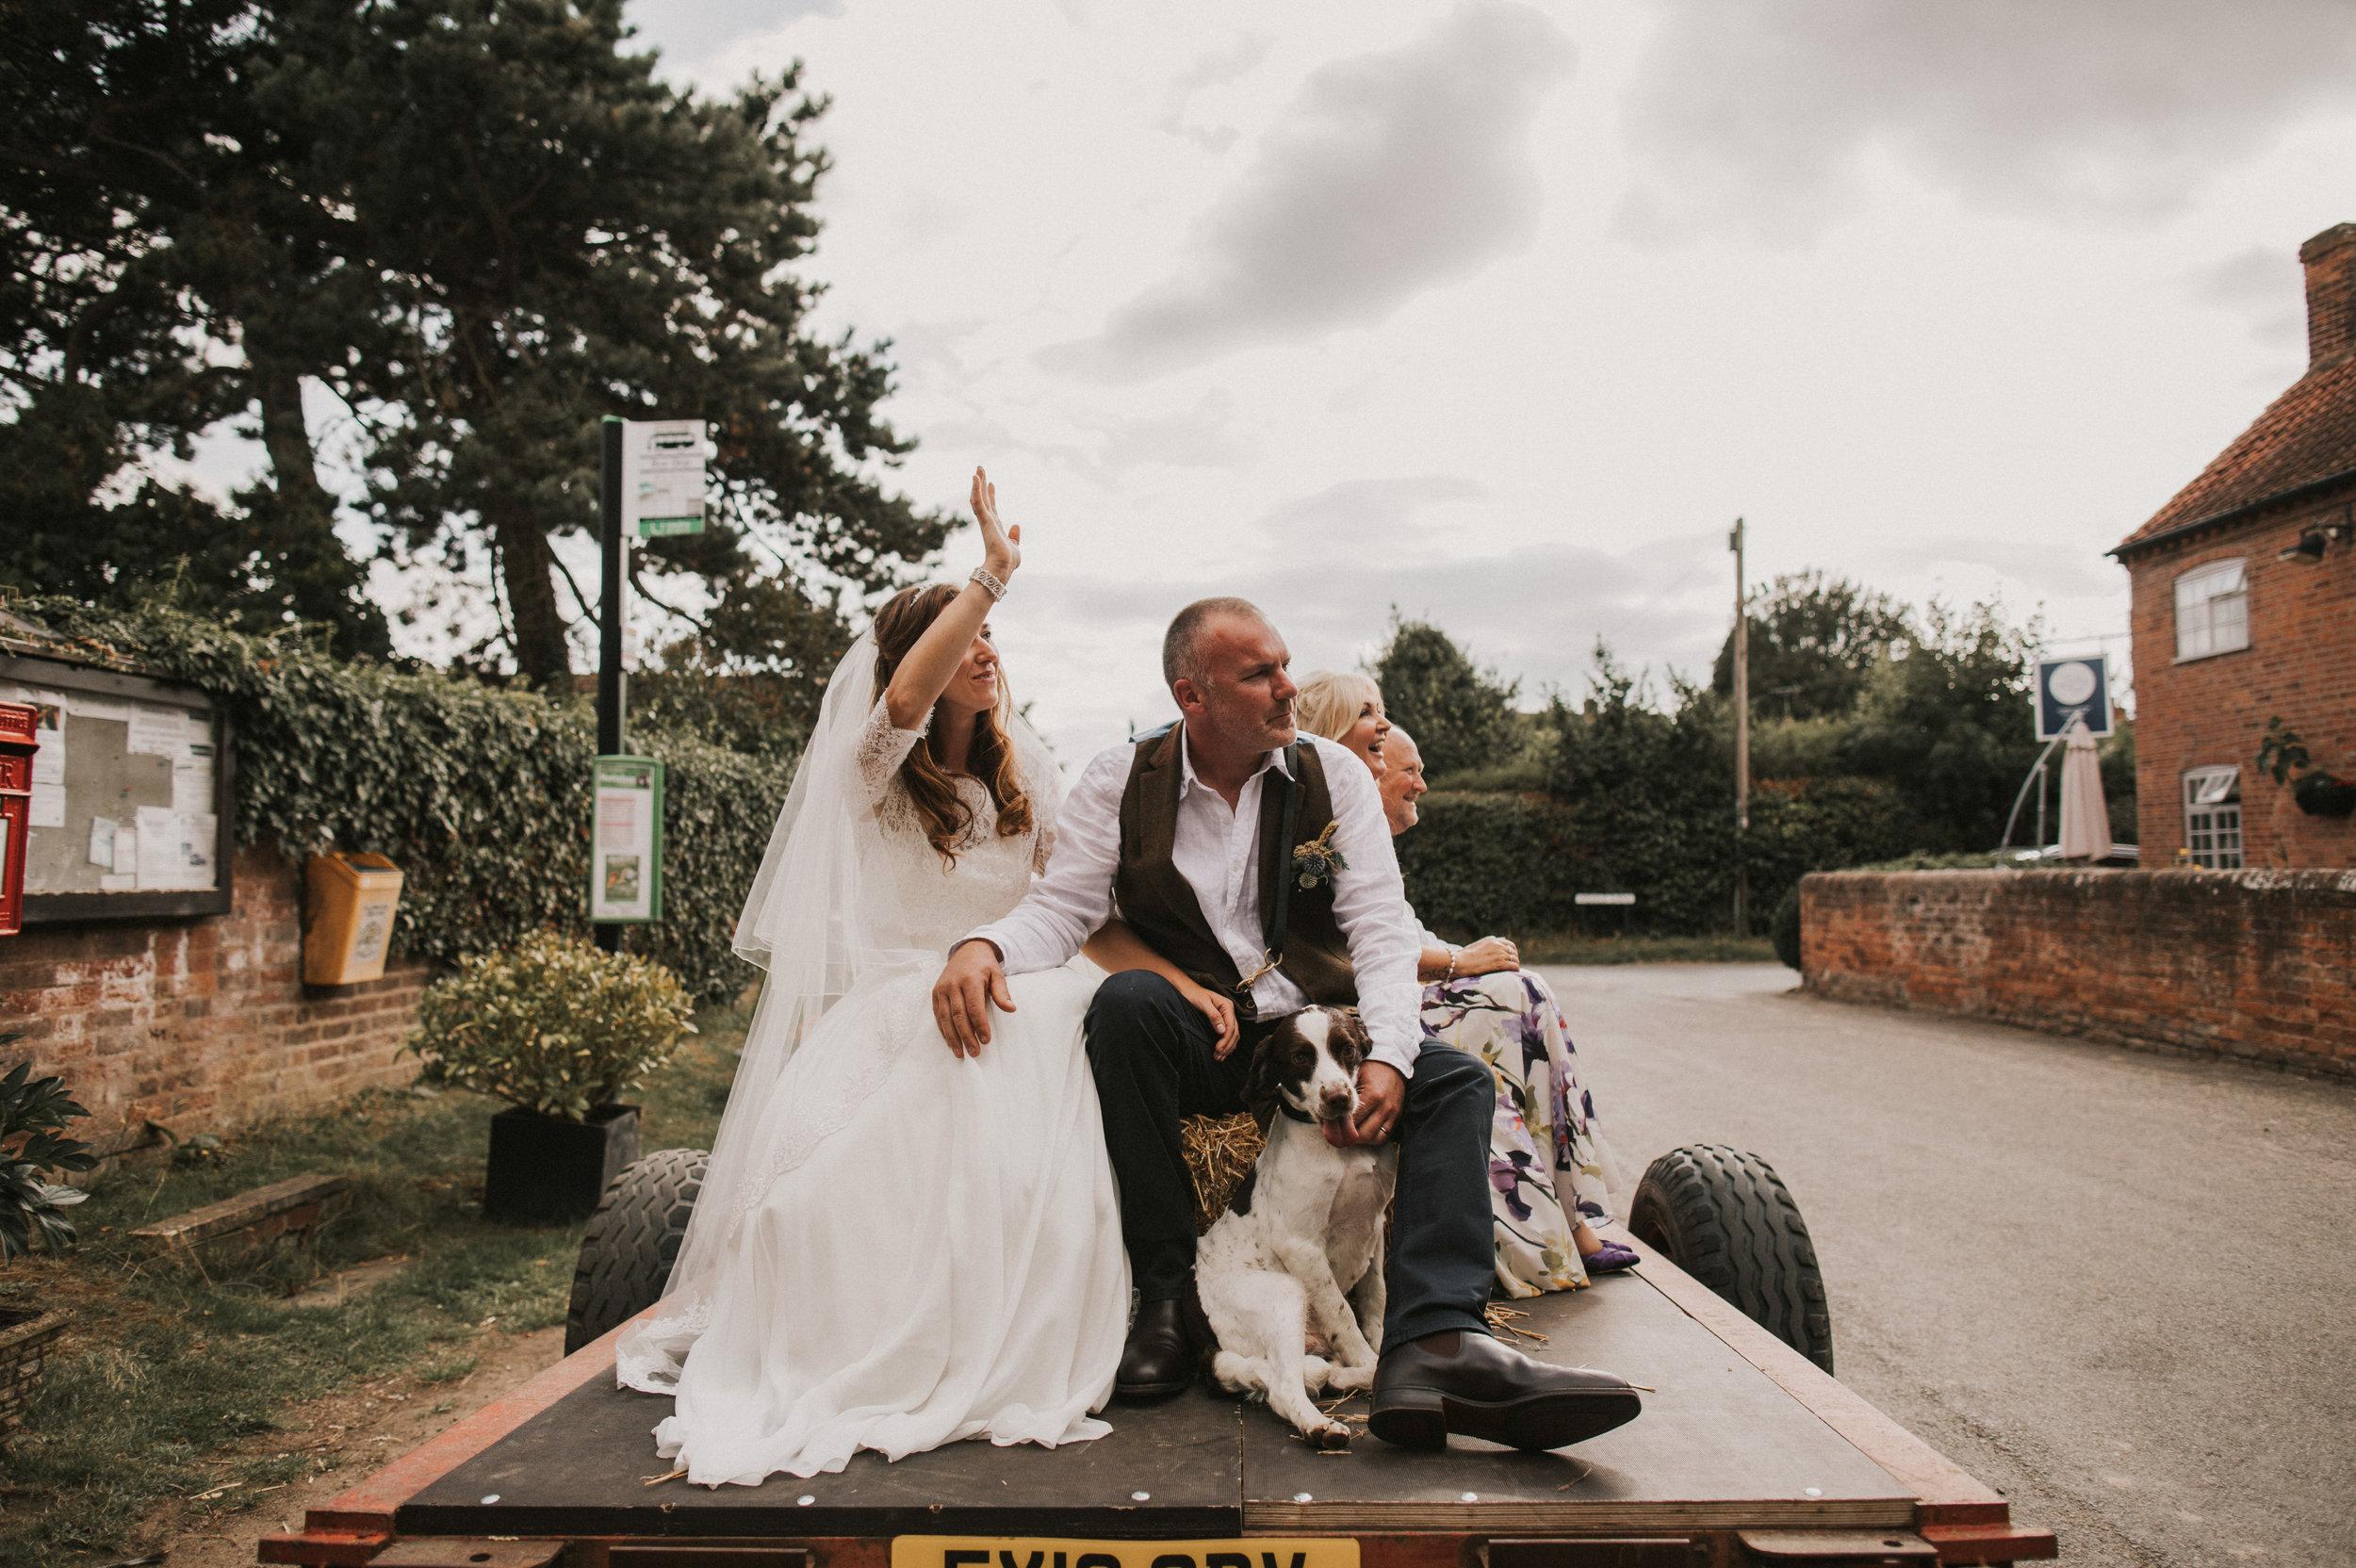 brook rose photography  Farm wedding_188.jpg